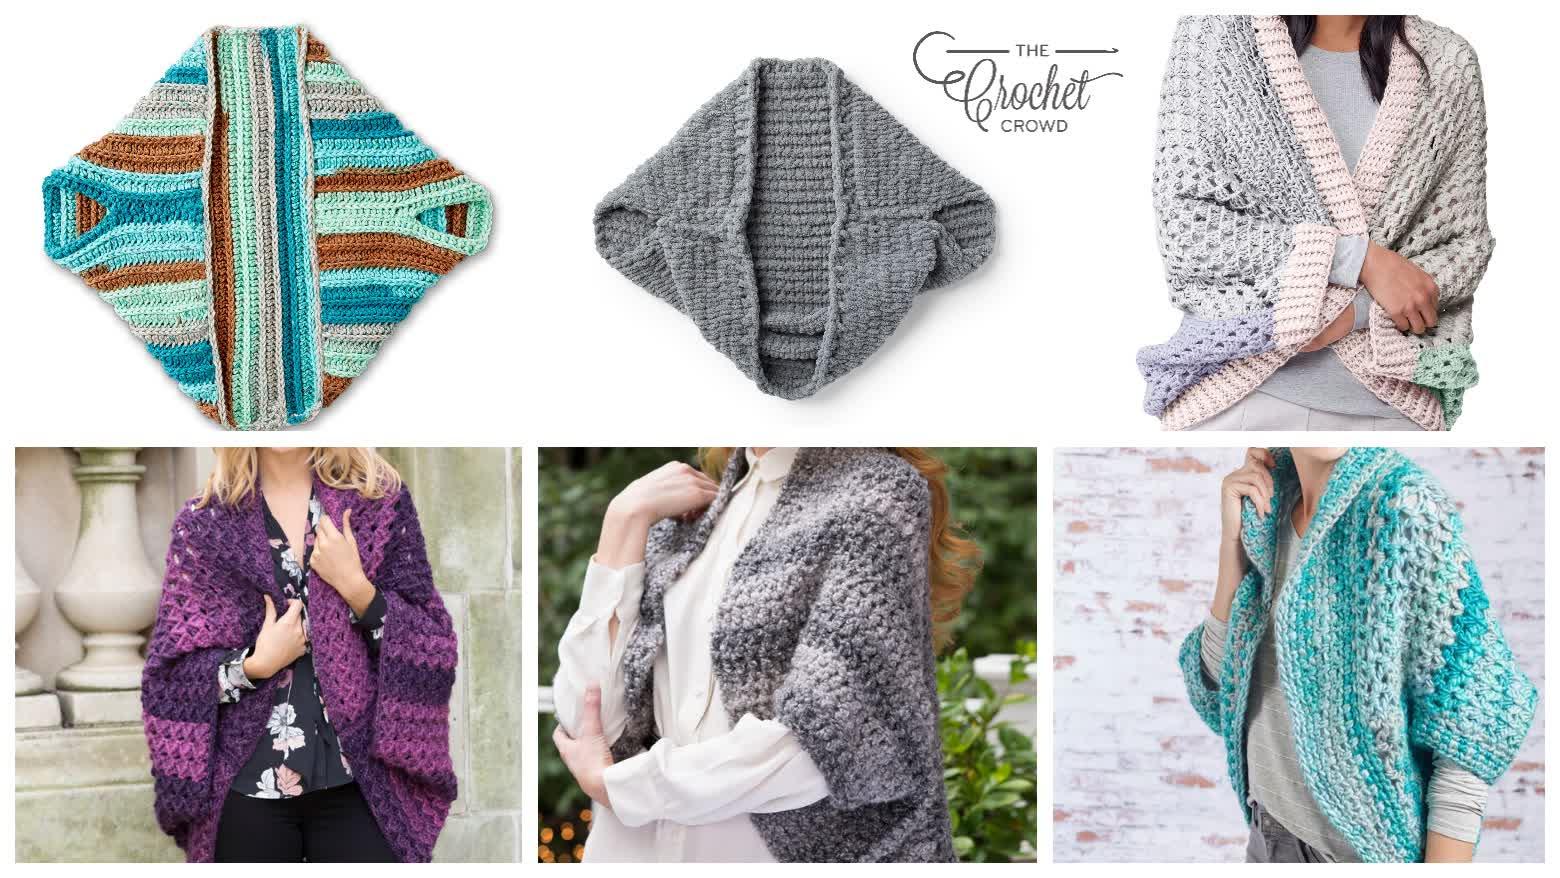 6 Crochet Simple Shrug Patterns